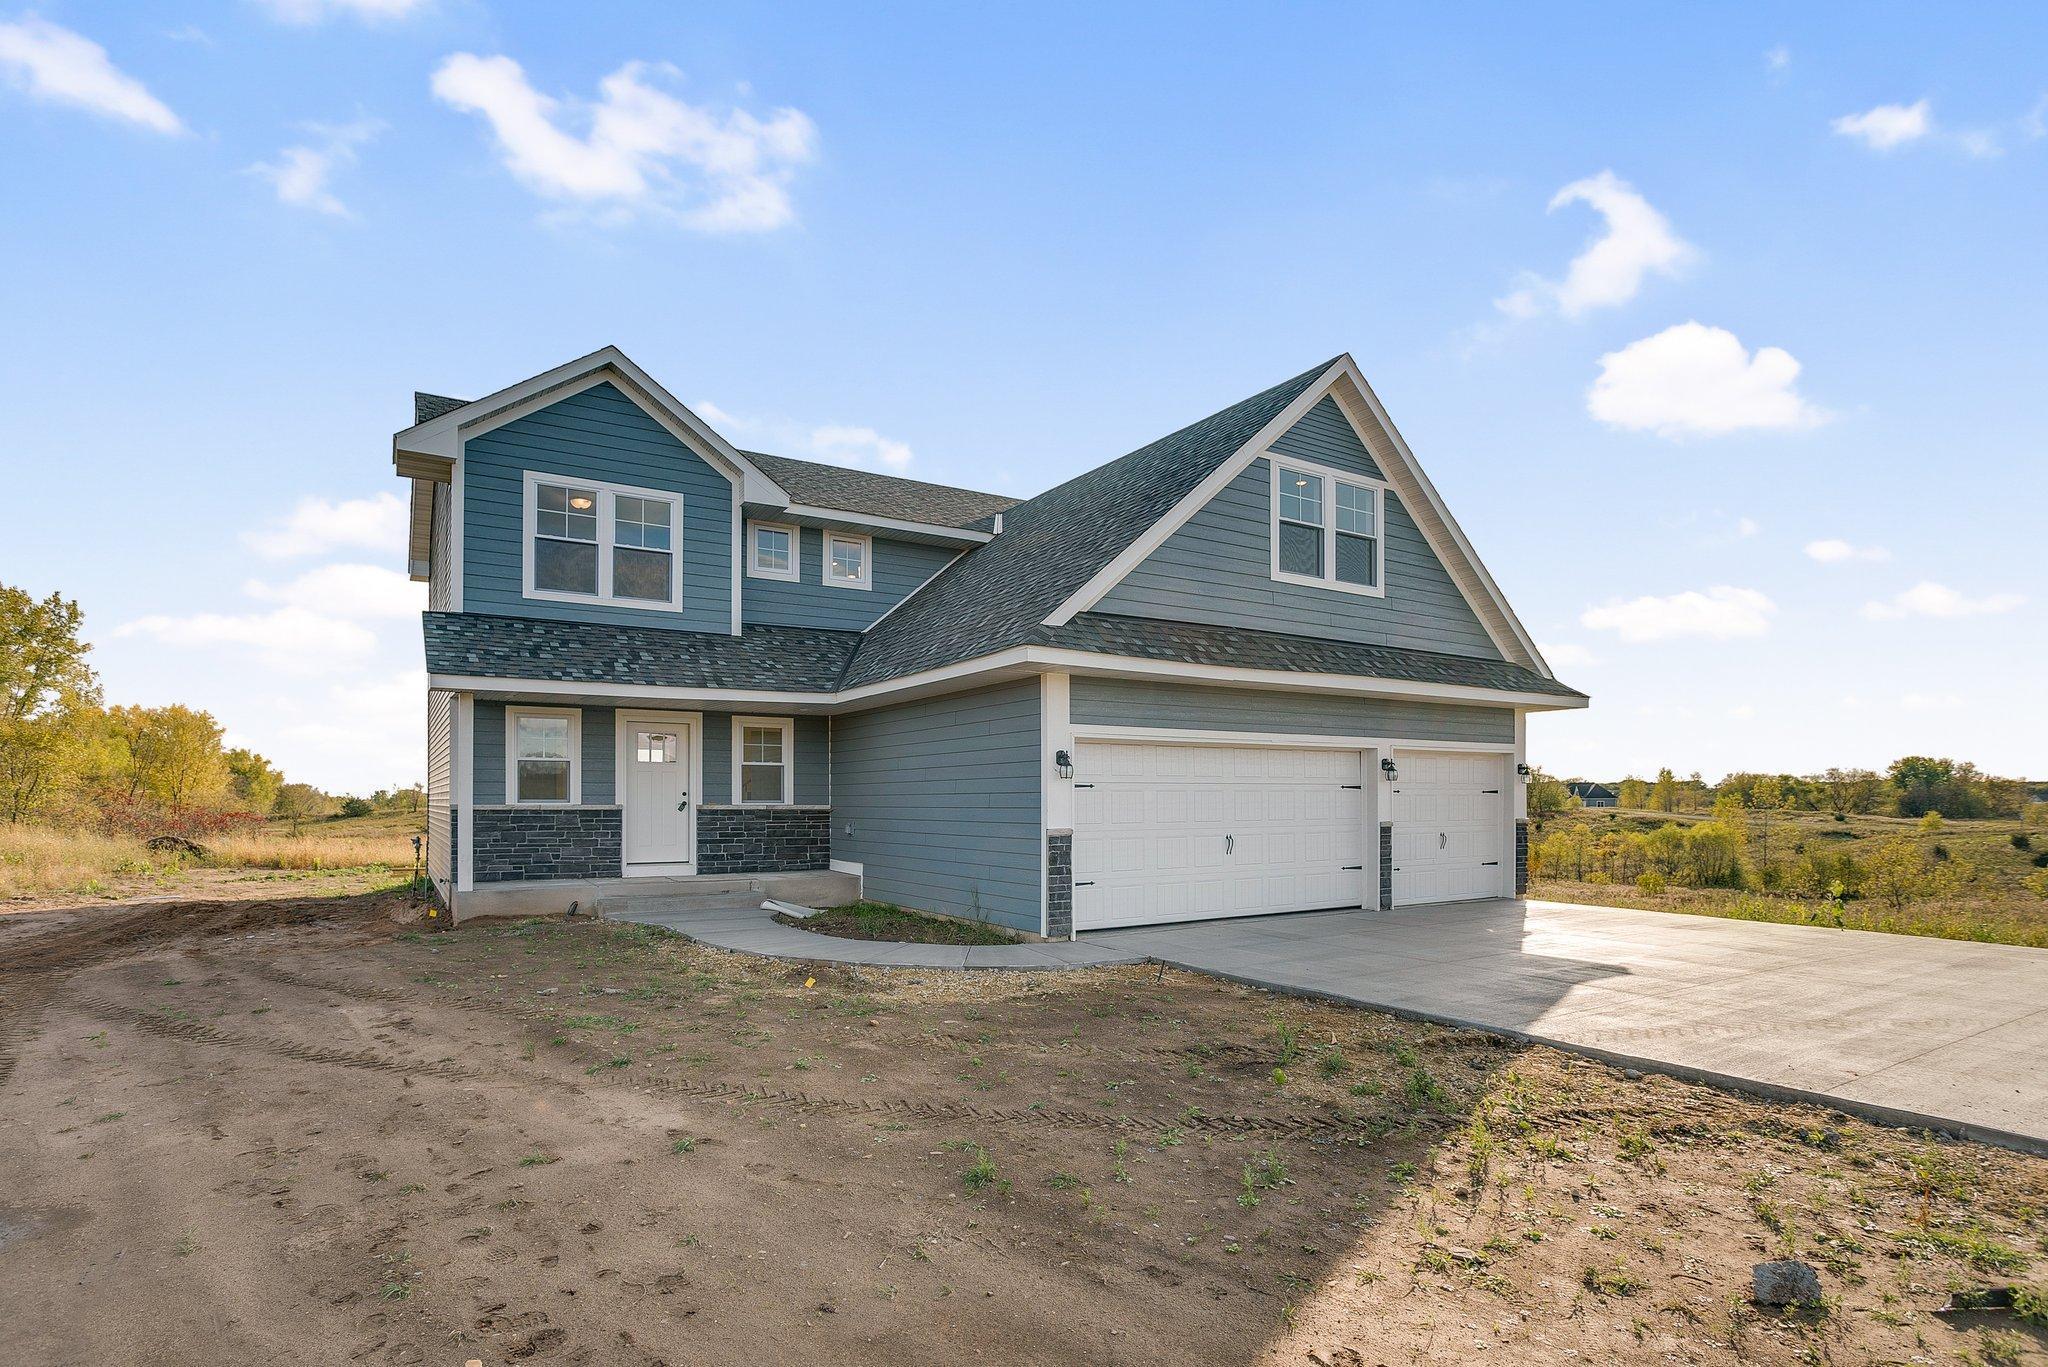 497 149th Avenue Property Photo - Saint Joseph Twp, WI real estate listing